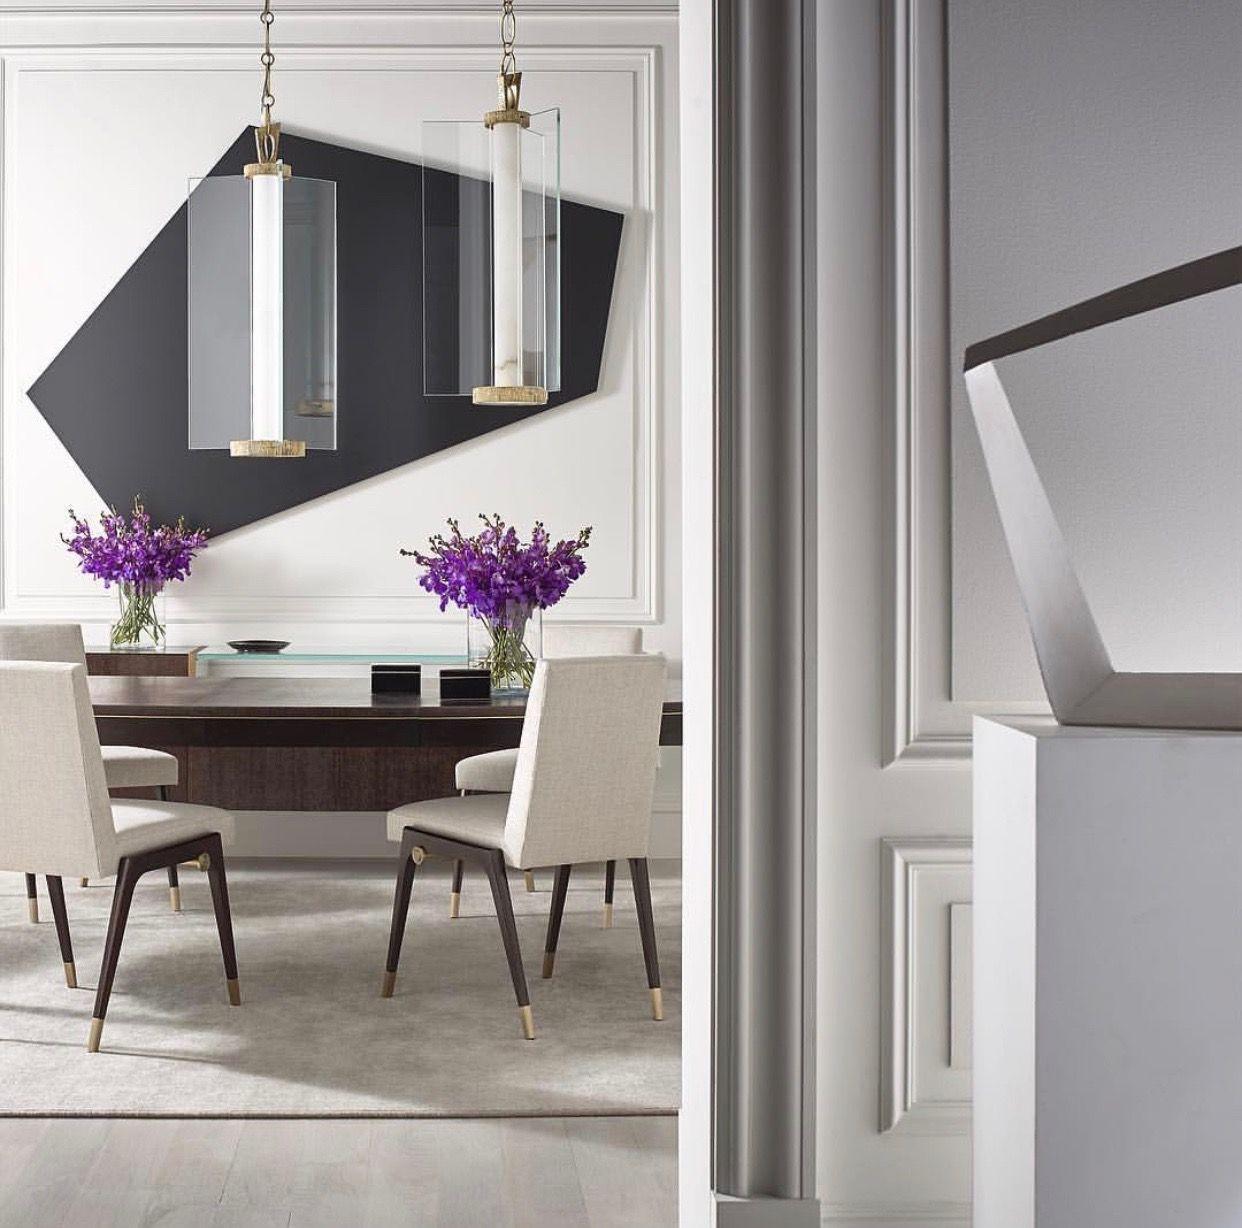 Thomas Pheasant Dining Room Interior Design Bedroom Bedroom